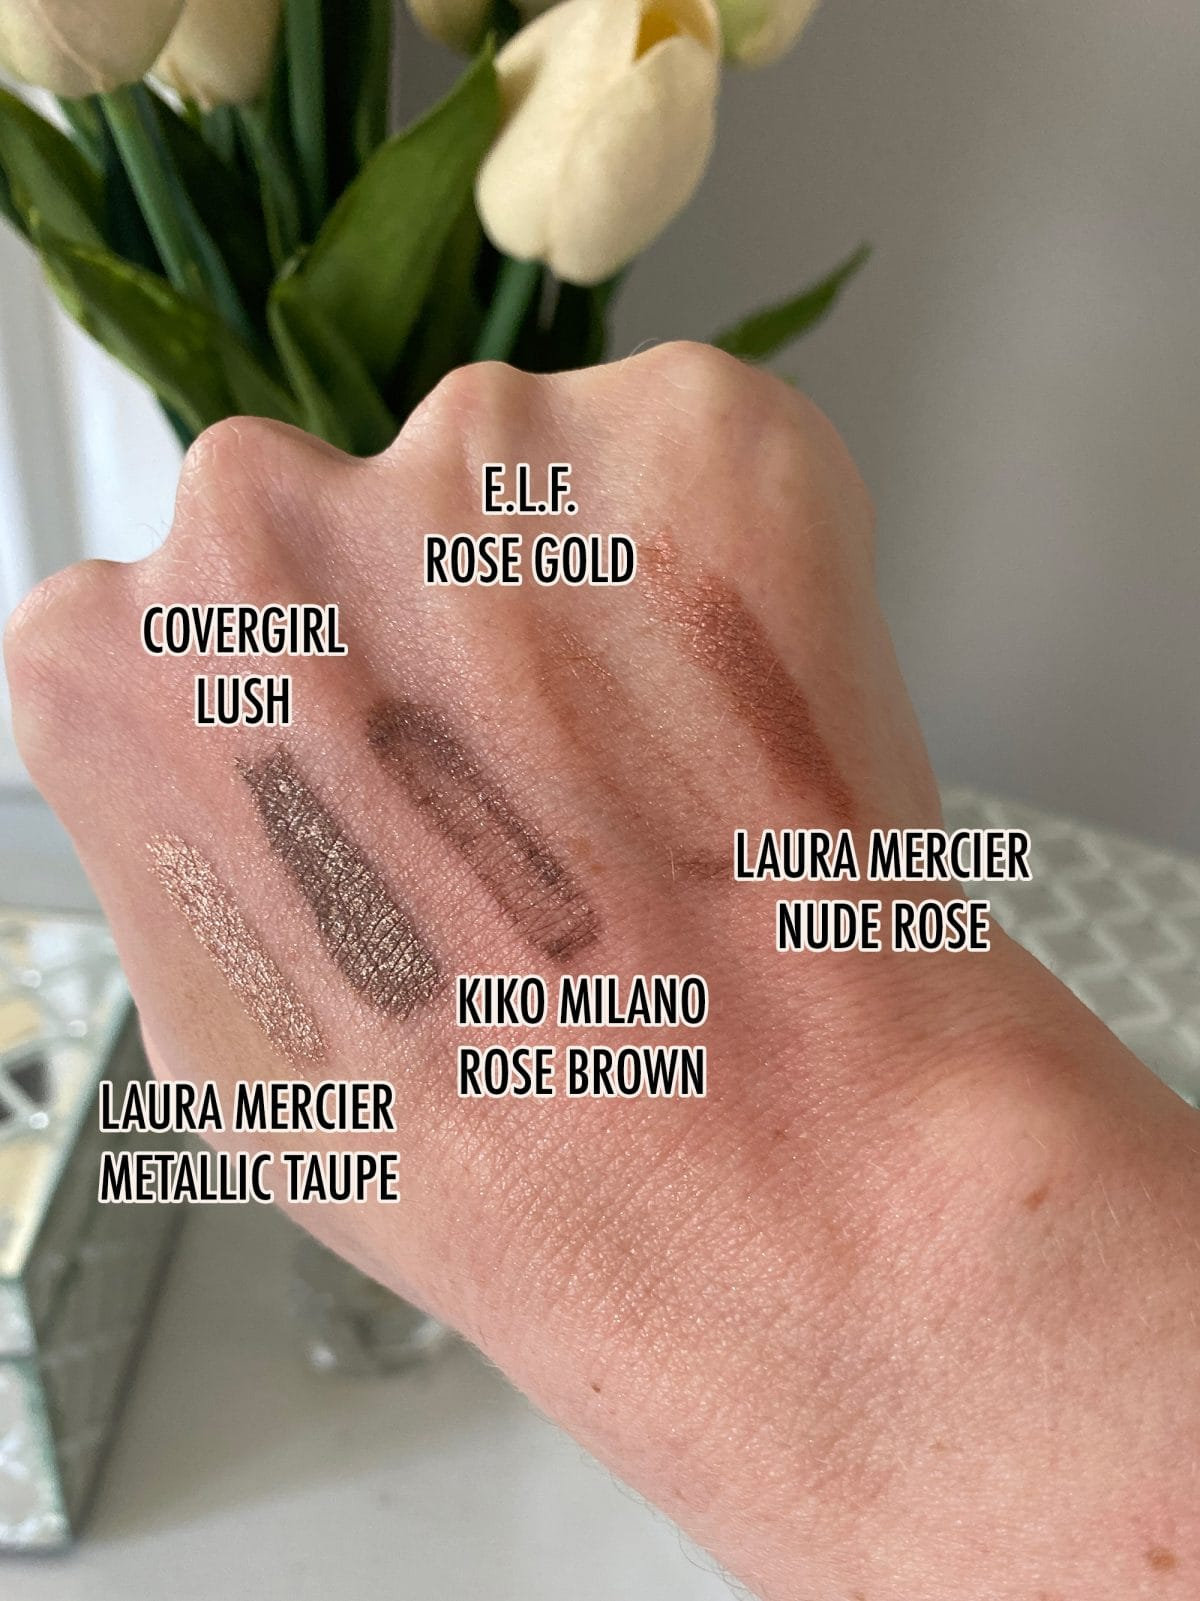 Texas beauty influencer Meg O. shares 3 Laura Mercier Caviar Stick dupes - CoverGirl, Kiko Milano, and elf!